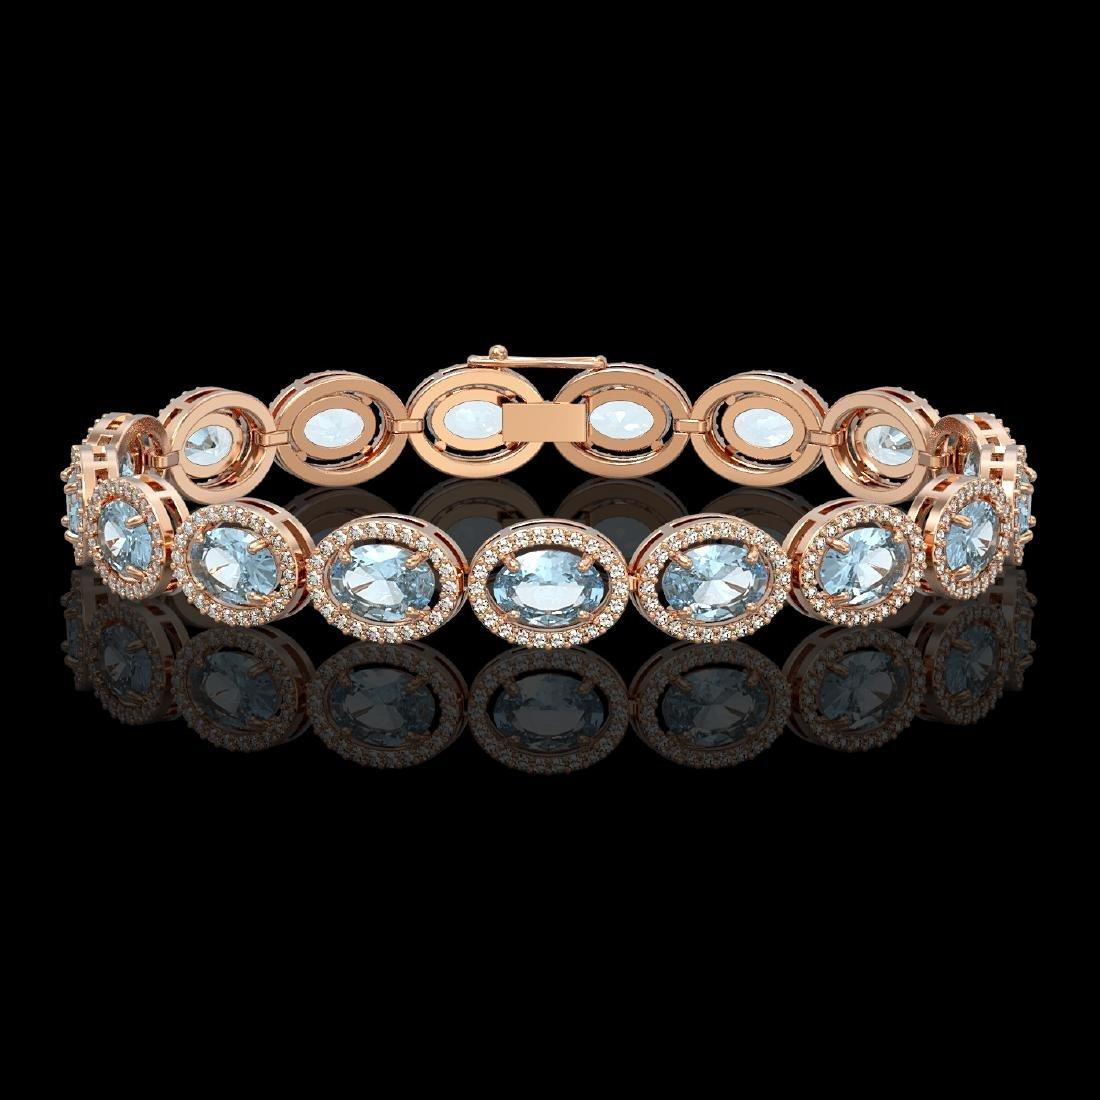 24.32 CTW Sky Topaz & Diamond Halo Bracelet 10K Rose